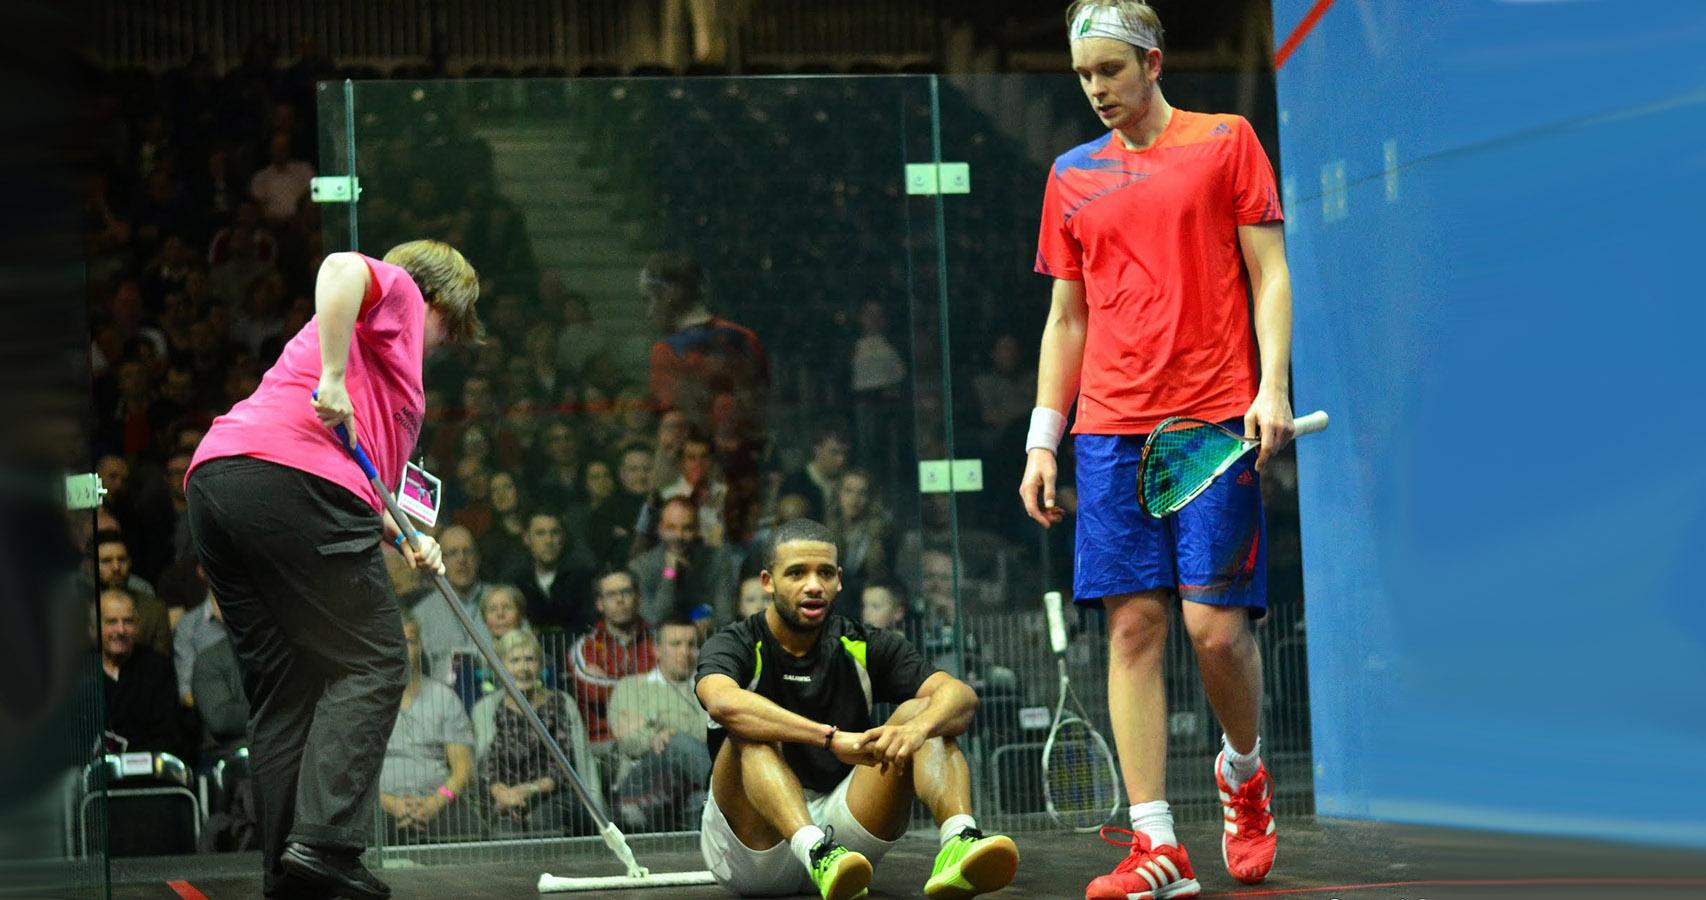 Volunteer at the National Squash Championships